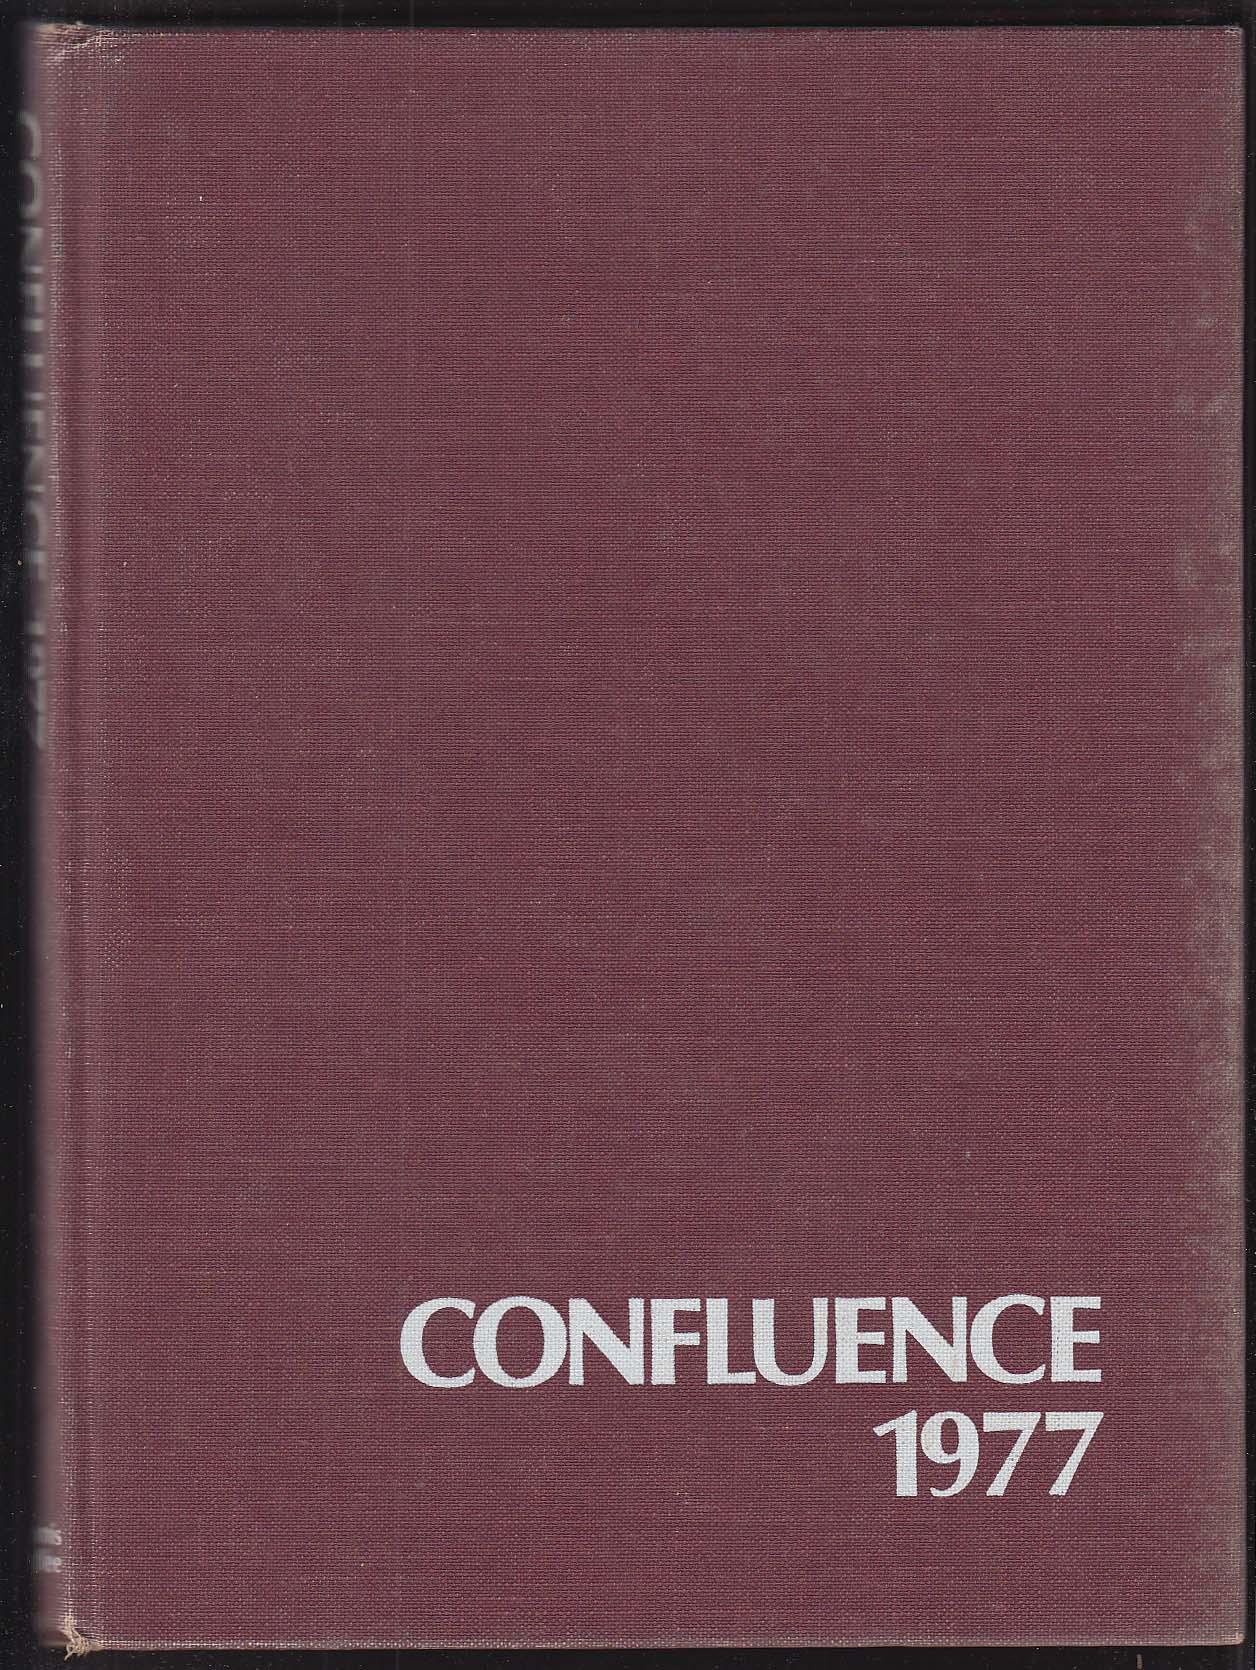 Image for Confluence 1977 Yearbook Loomis Chaffee School Windsor CT David Edelstein